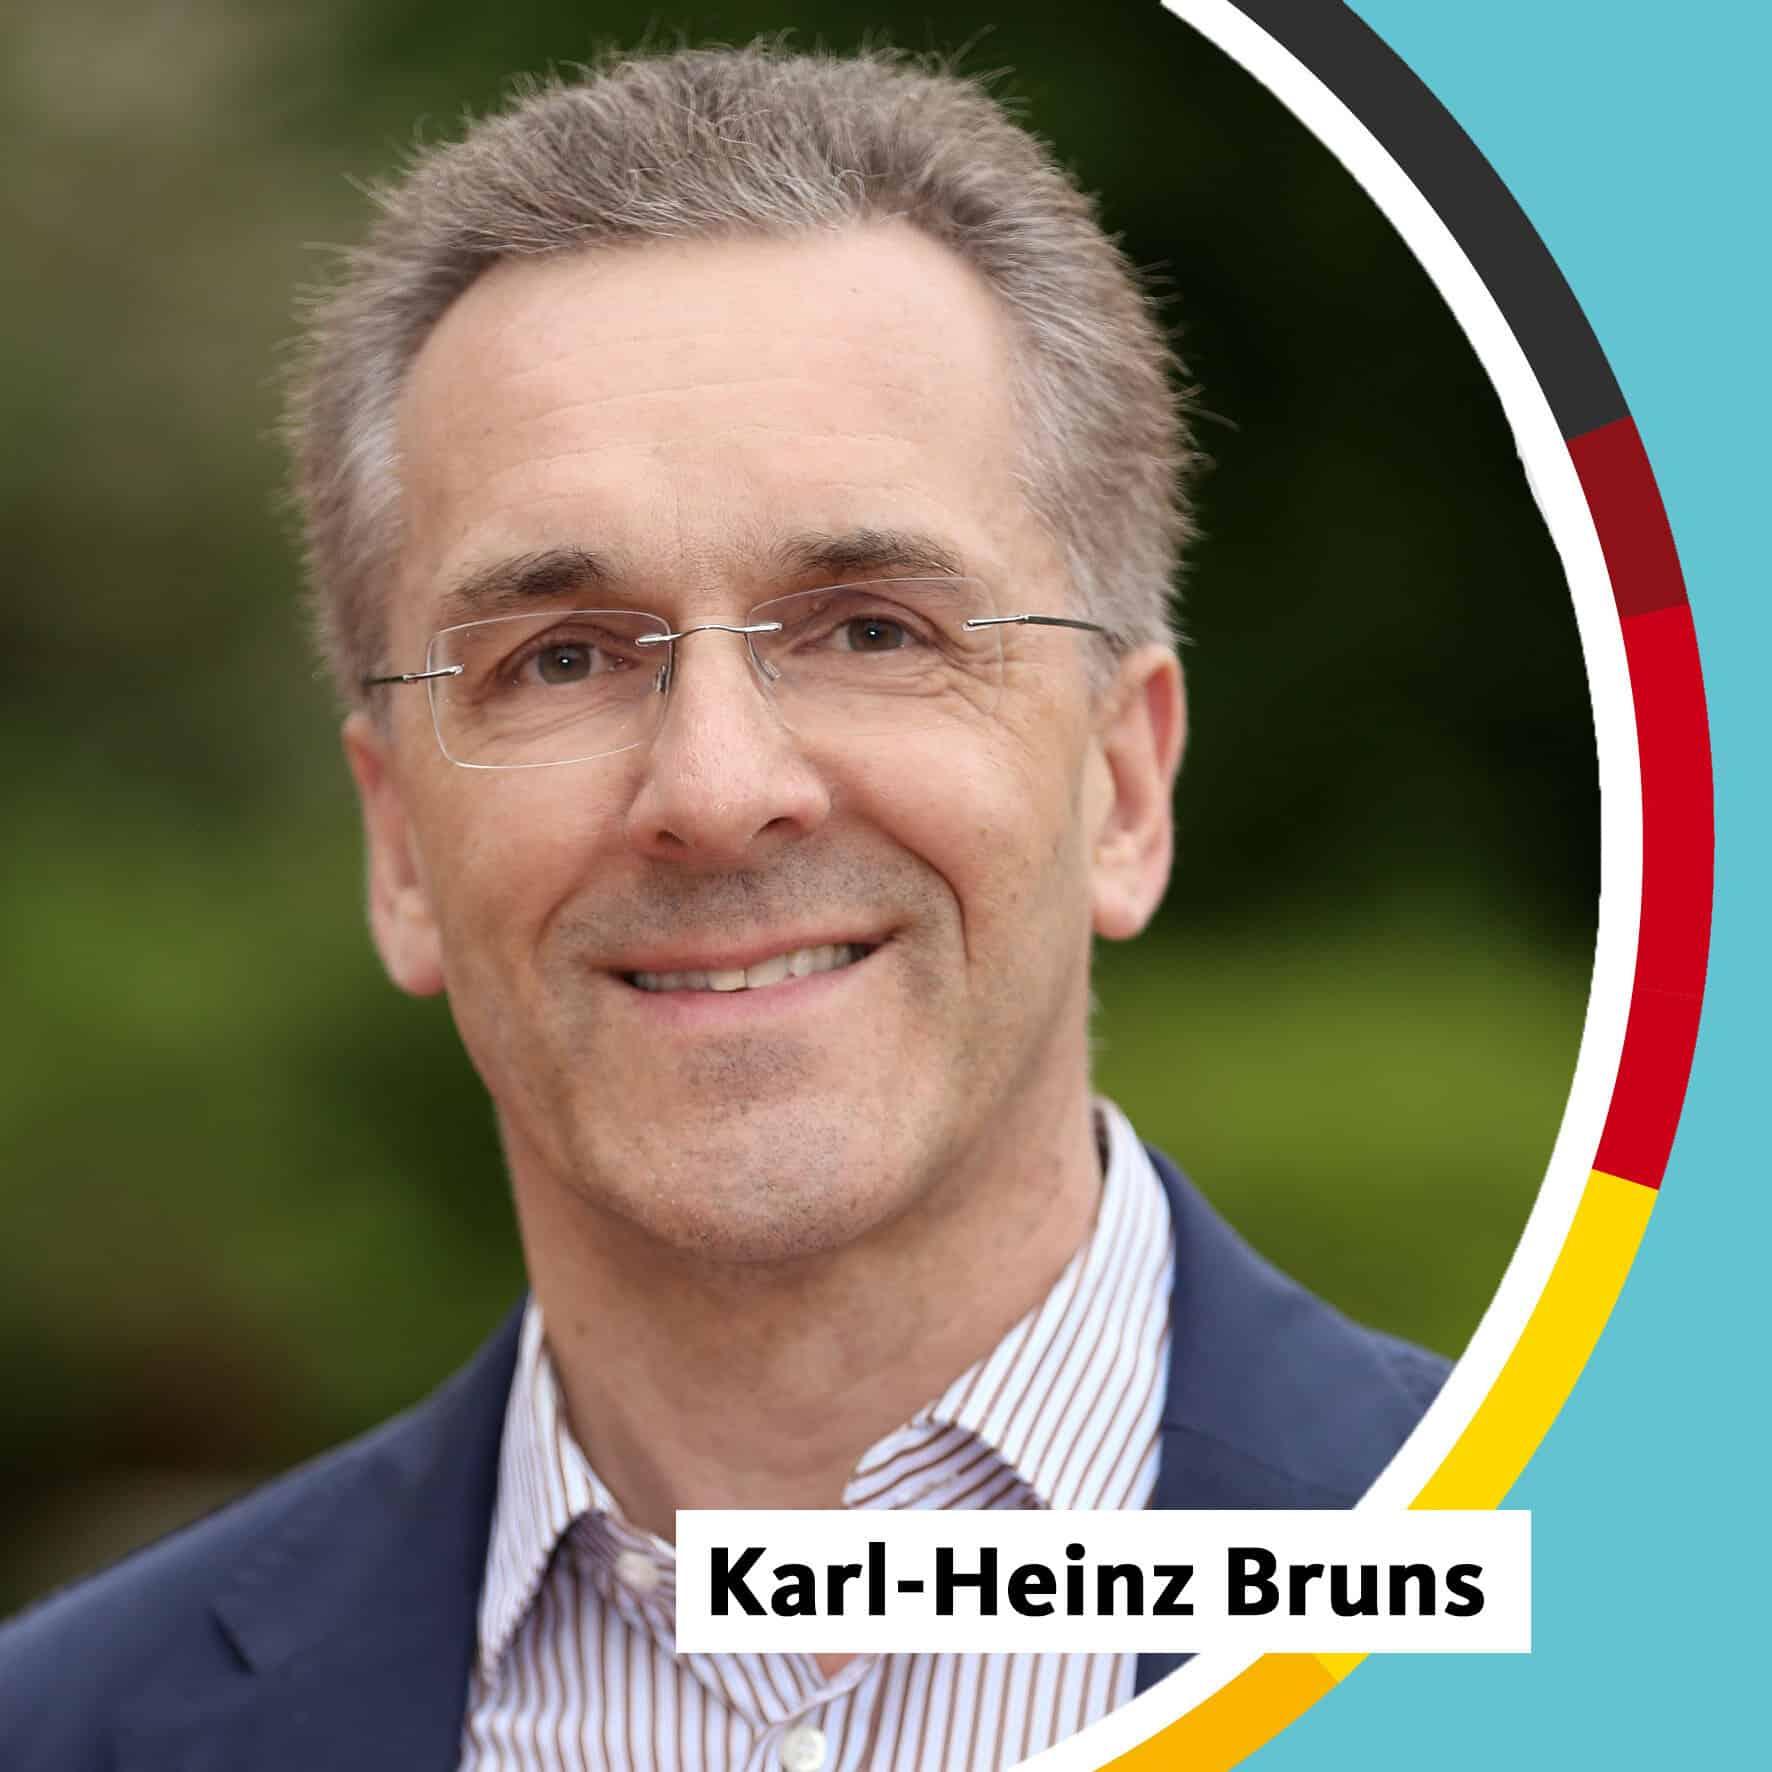 Karl-Heinz Bruns